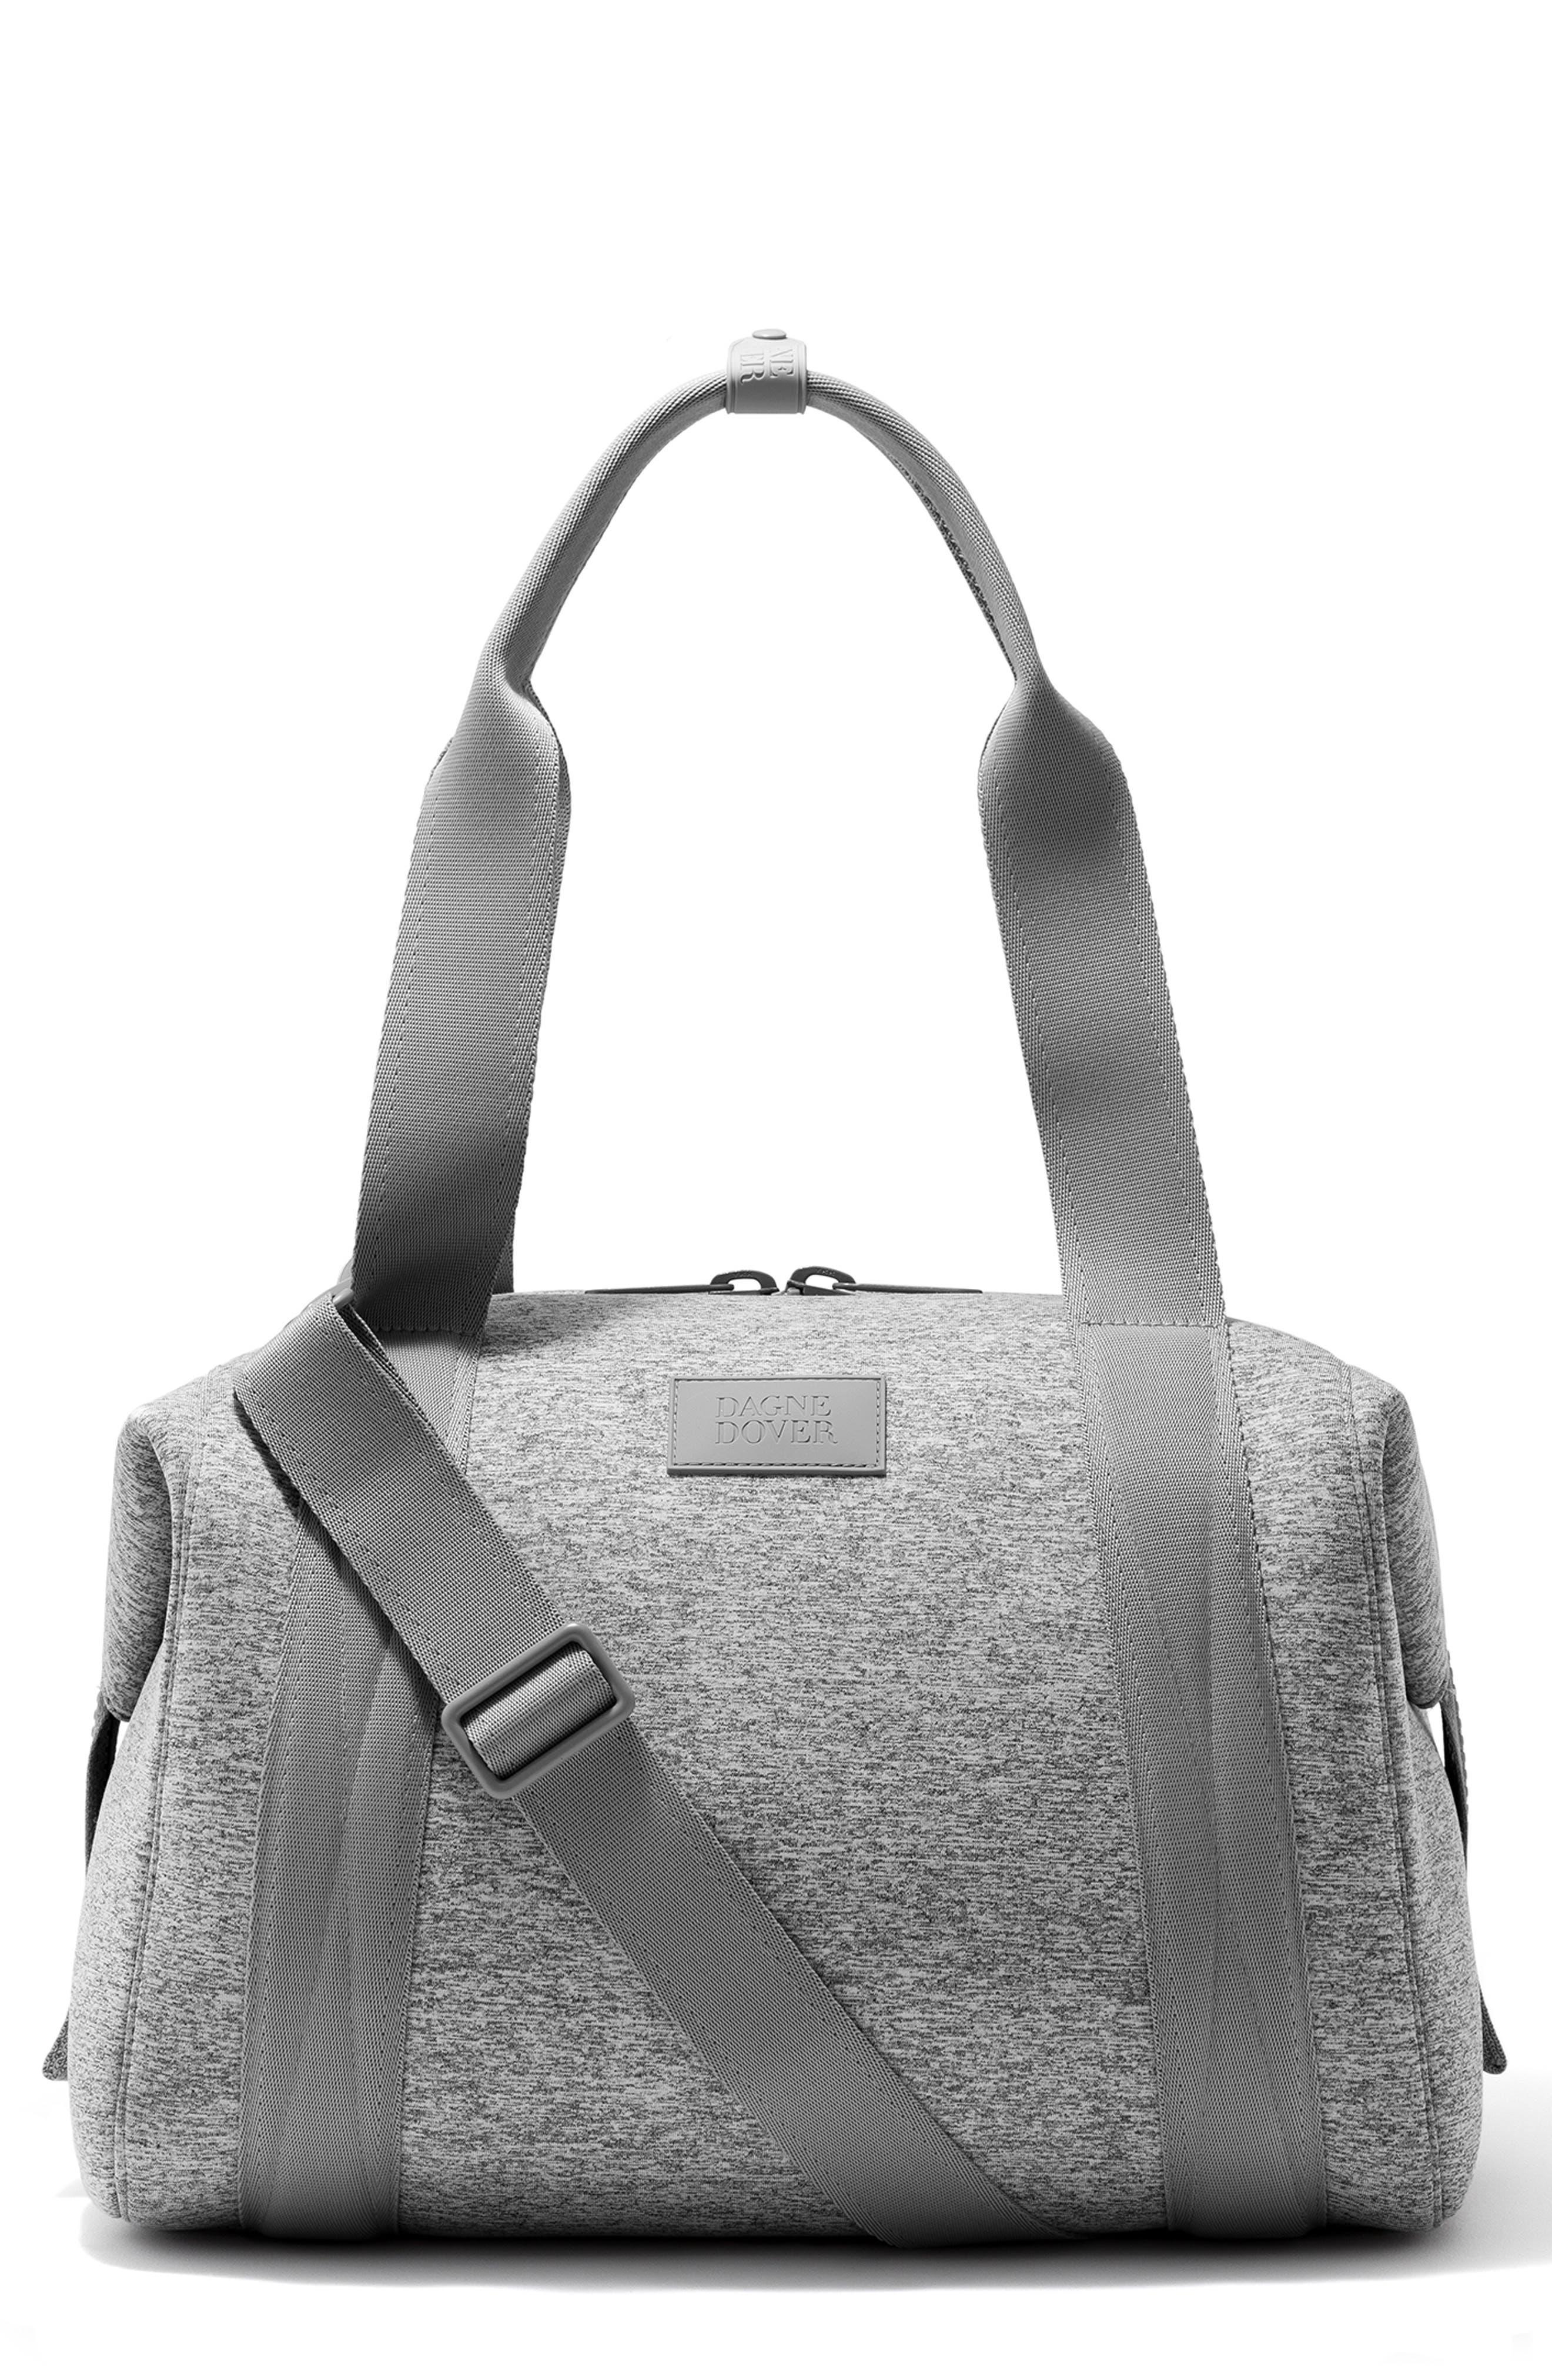 DAGNE DOVER 365 Medium Landon Neoprene Carryall Duffle Bag, Main, color, HEATHER GREY